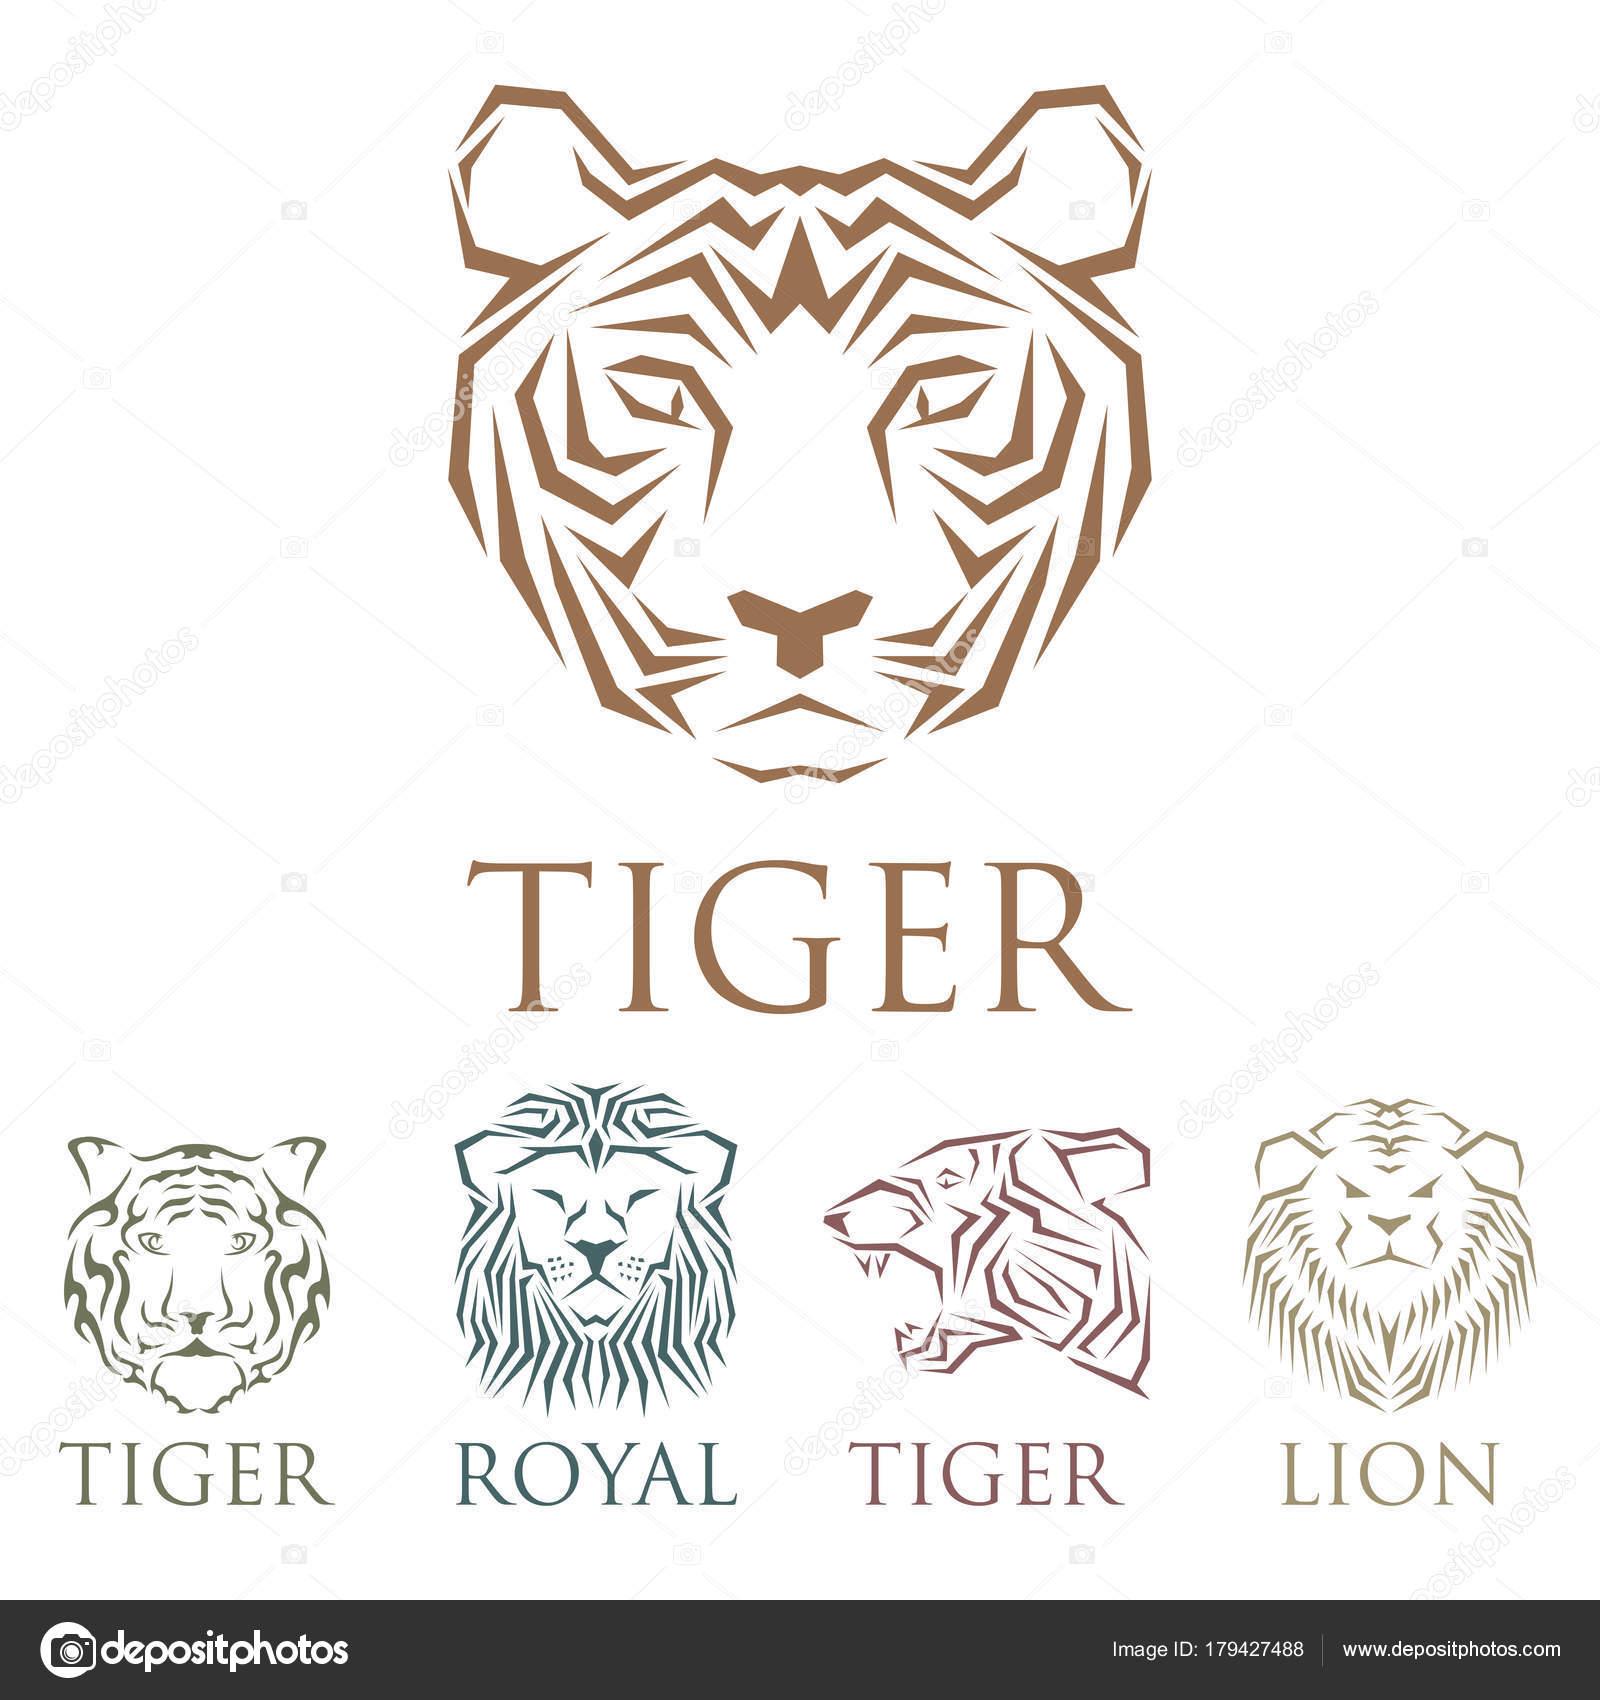 Imágenes Tigres Para Dibujar Reales Divisa Real Cabeza De Tigre